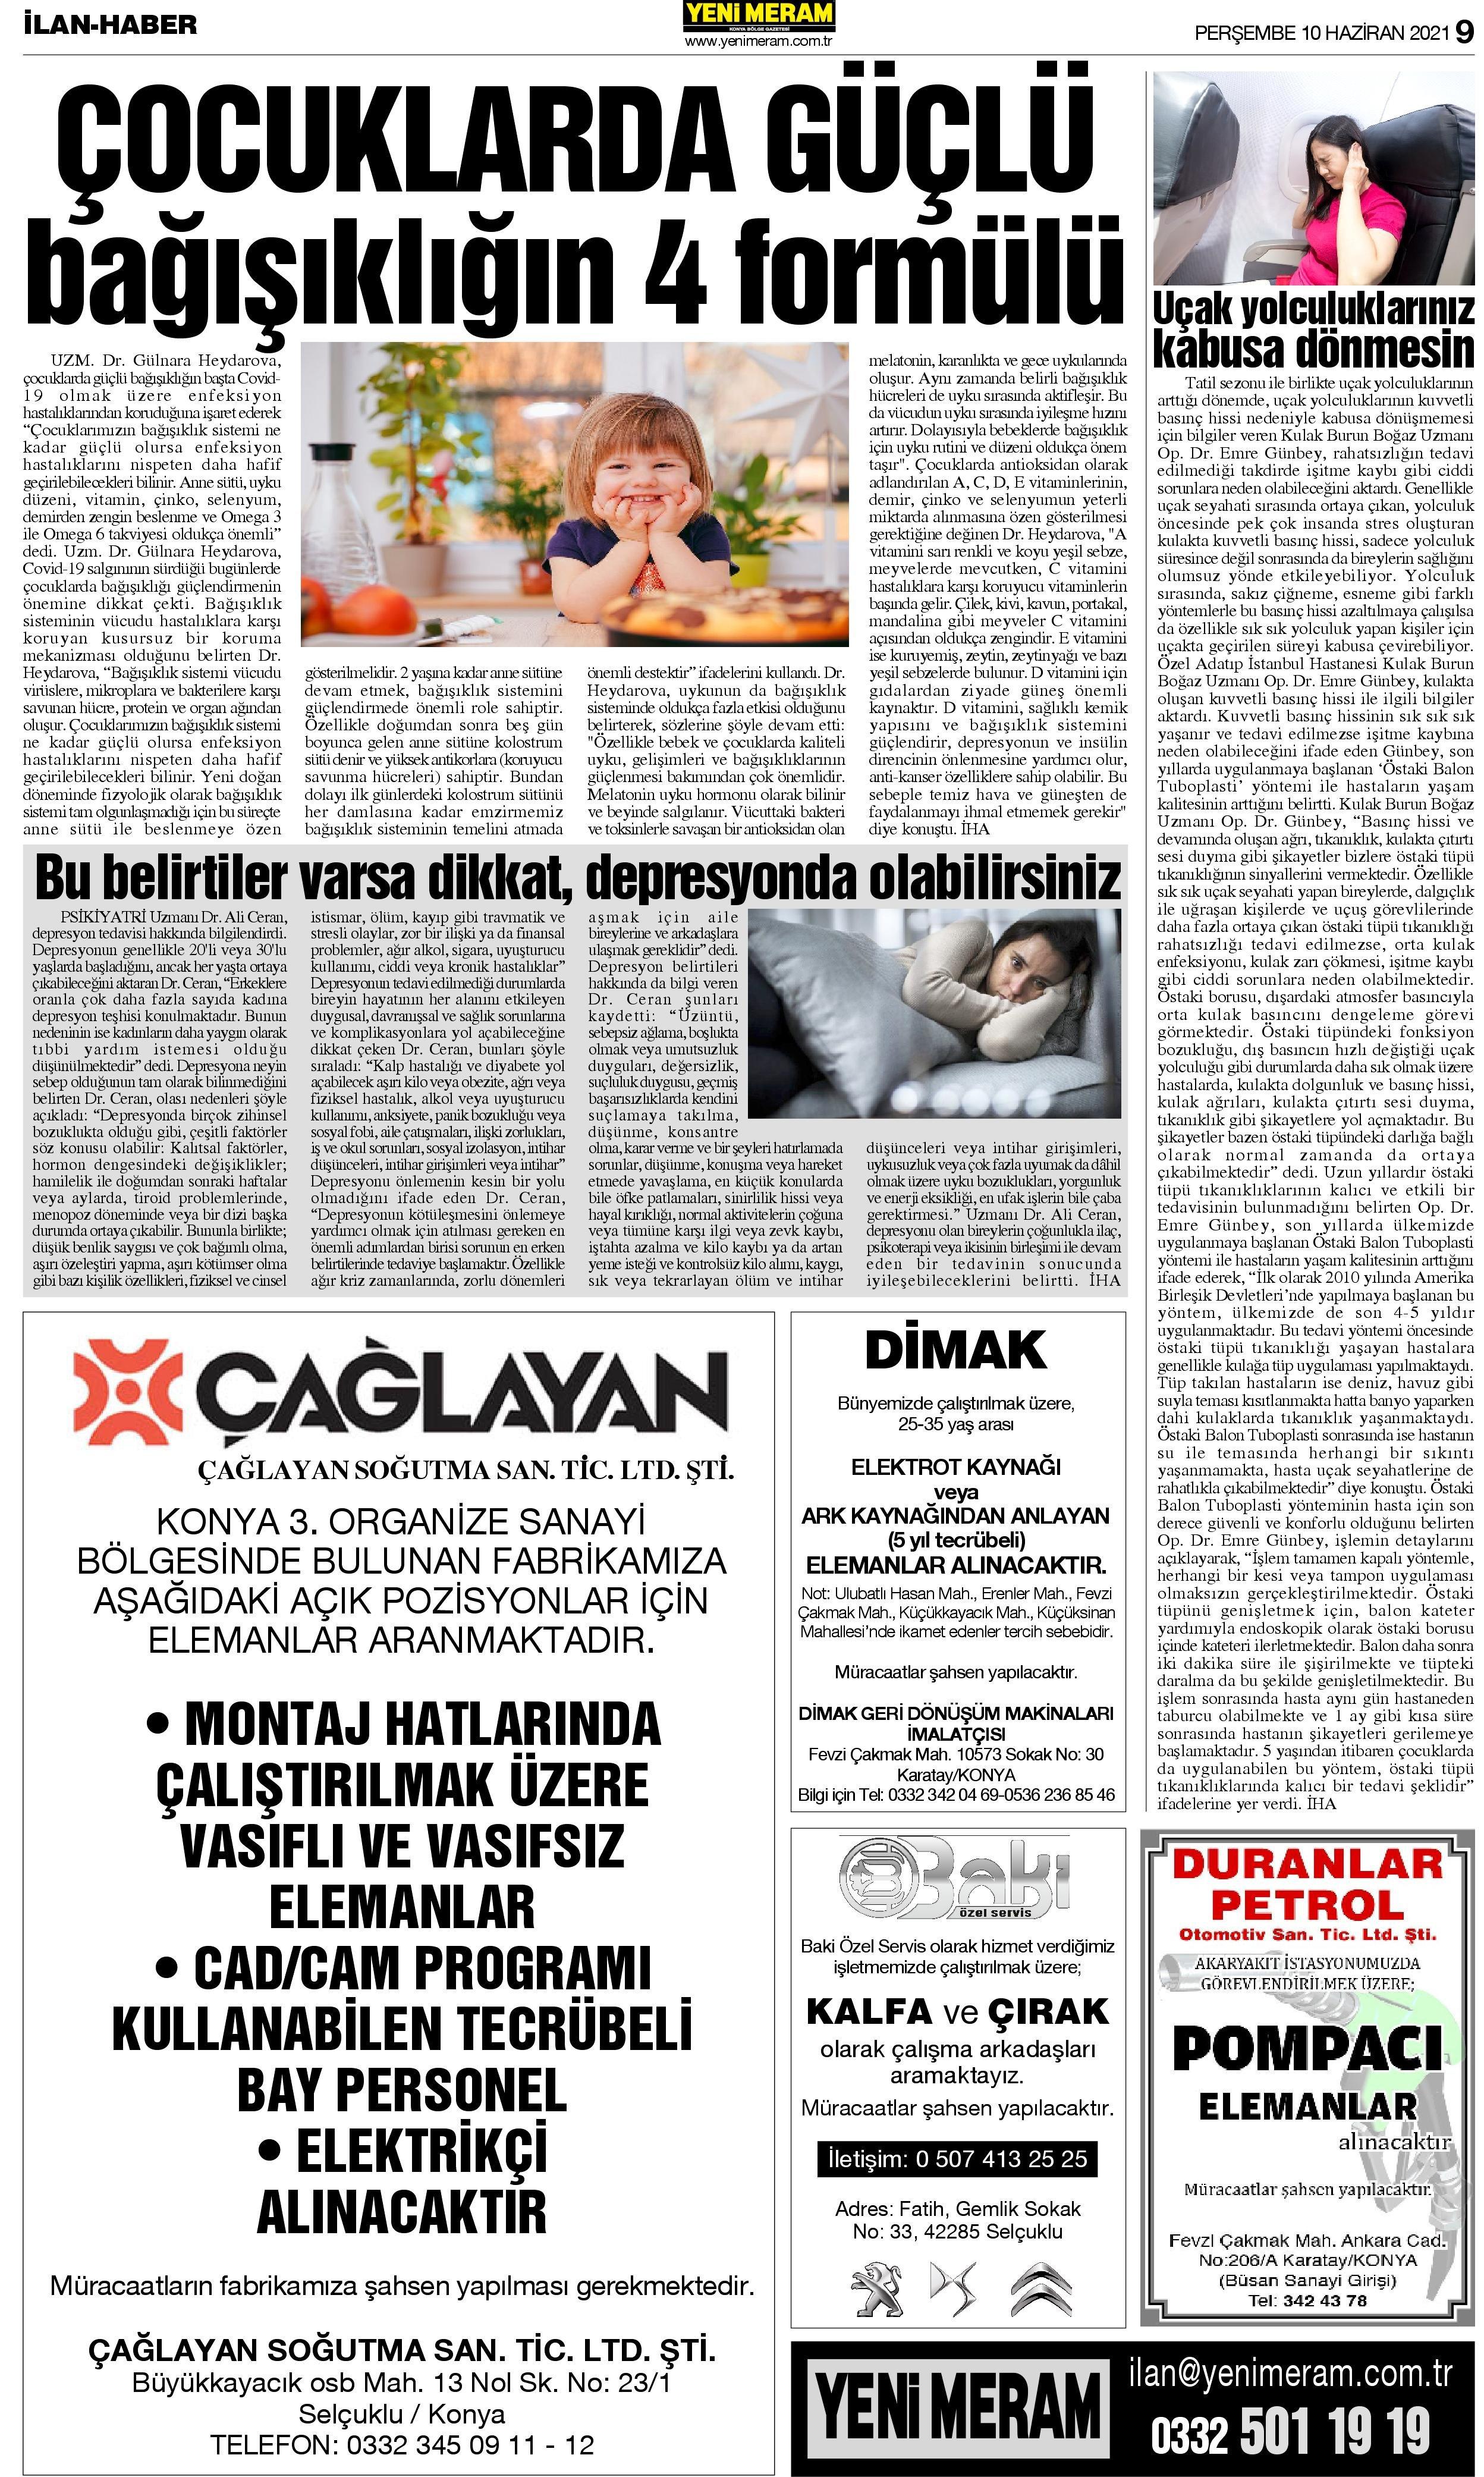 10 Haziran 2021 Yeni Meram Gazetesi